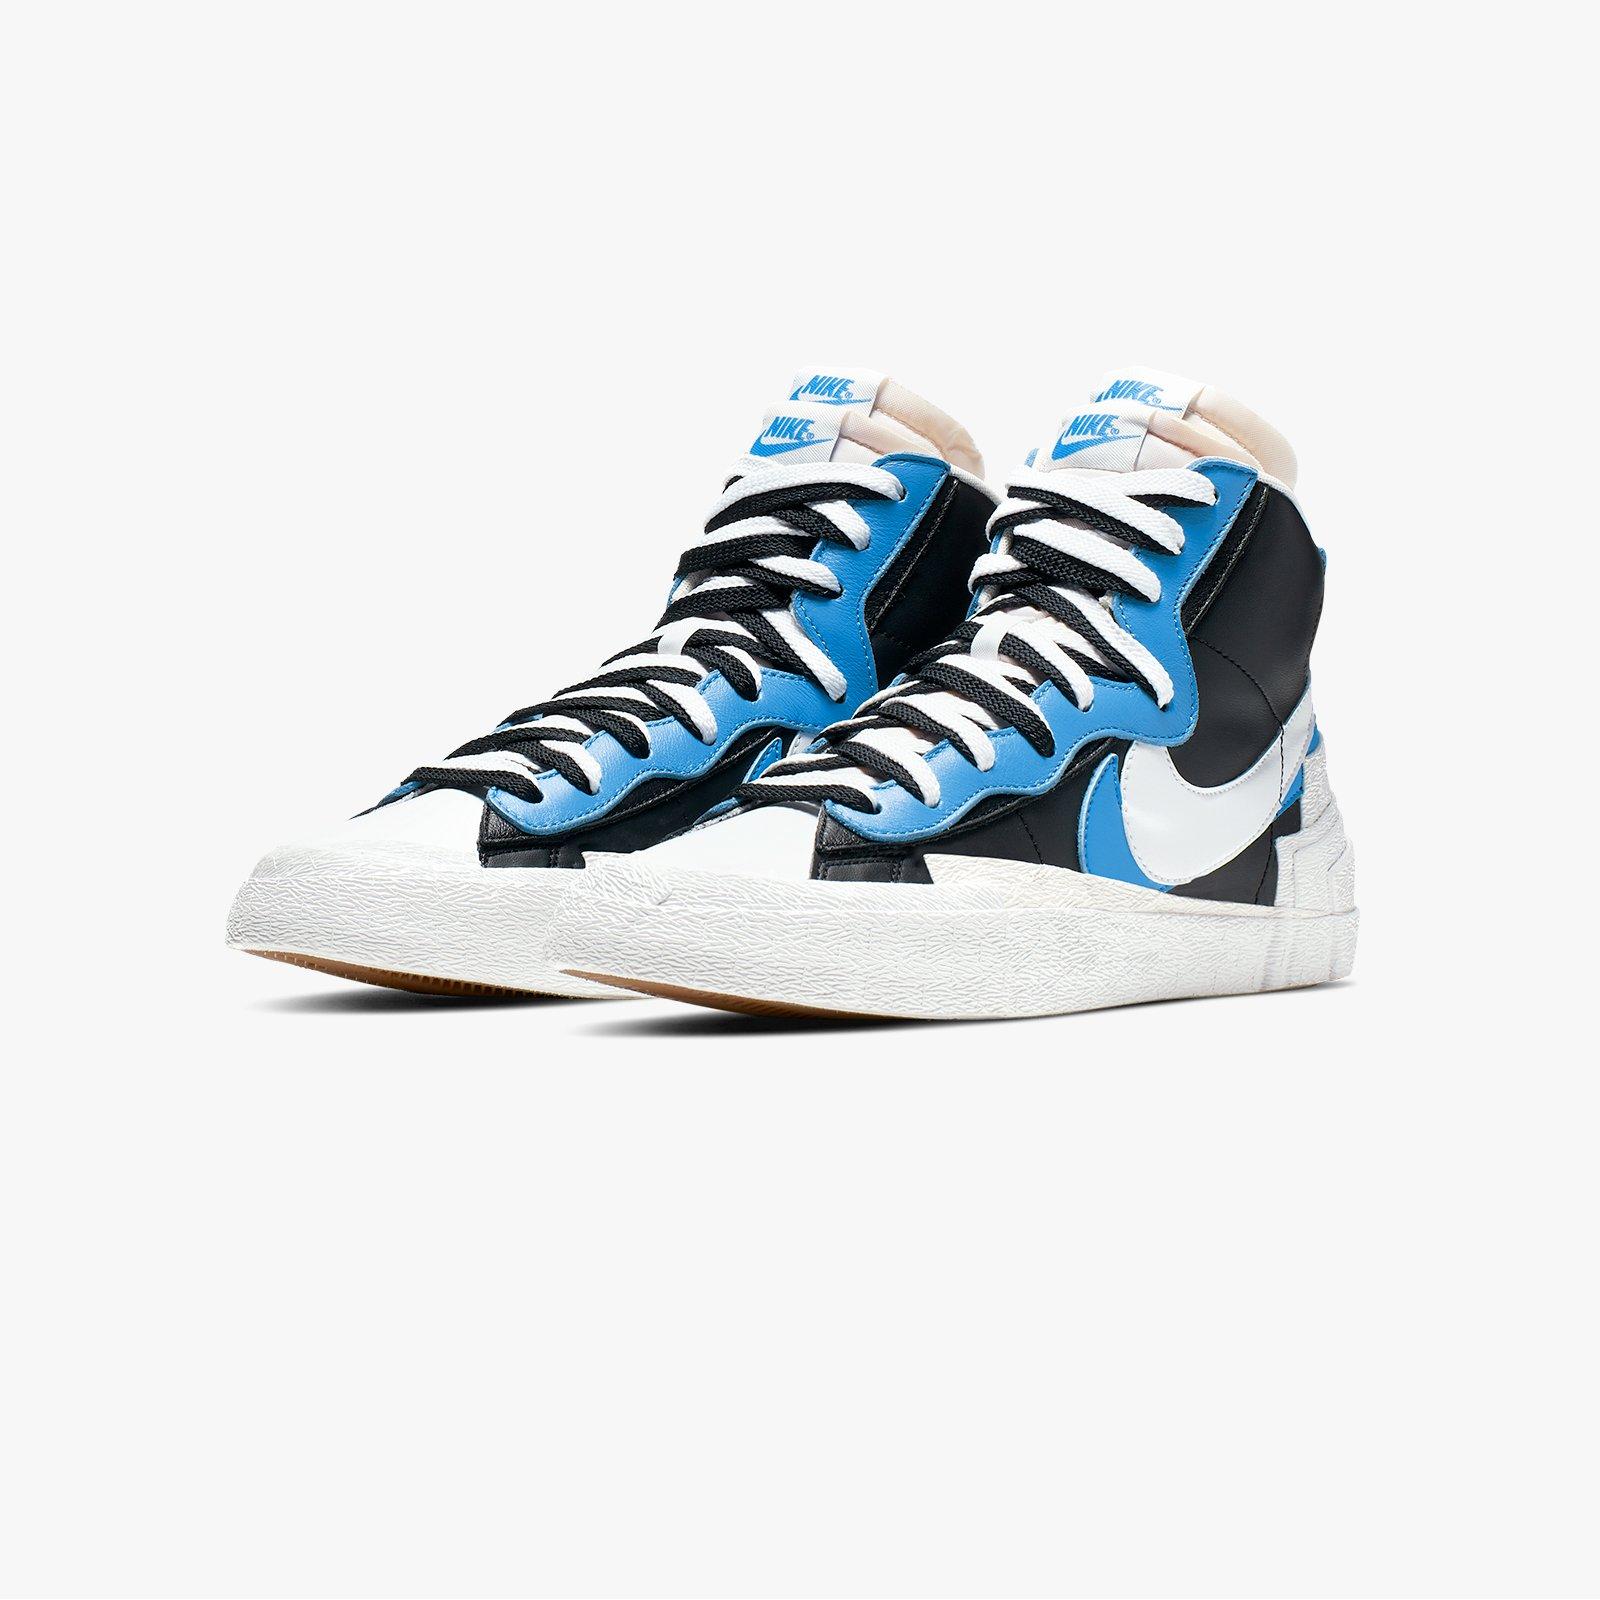 Nike Blazer Mid / SACAI - Bv0072-001